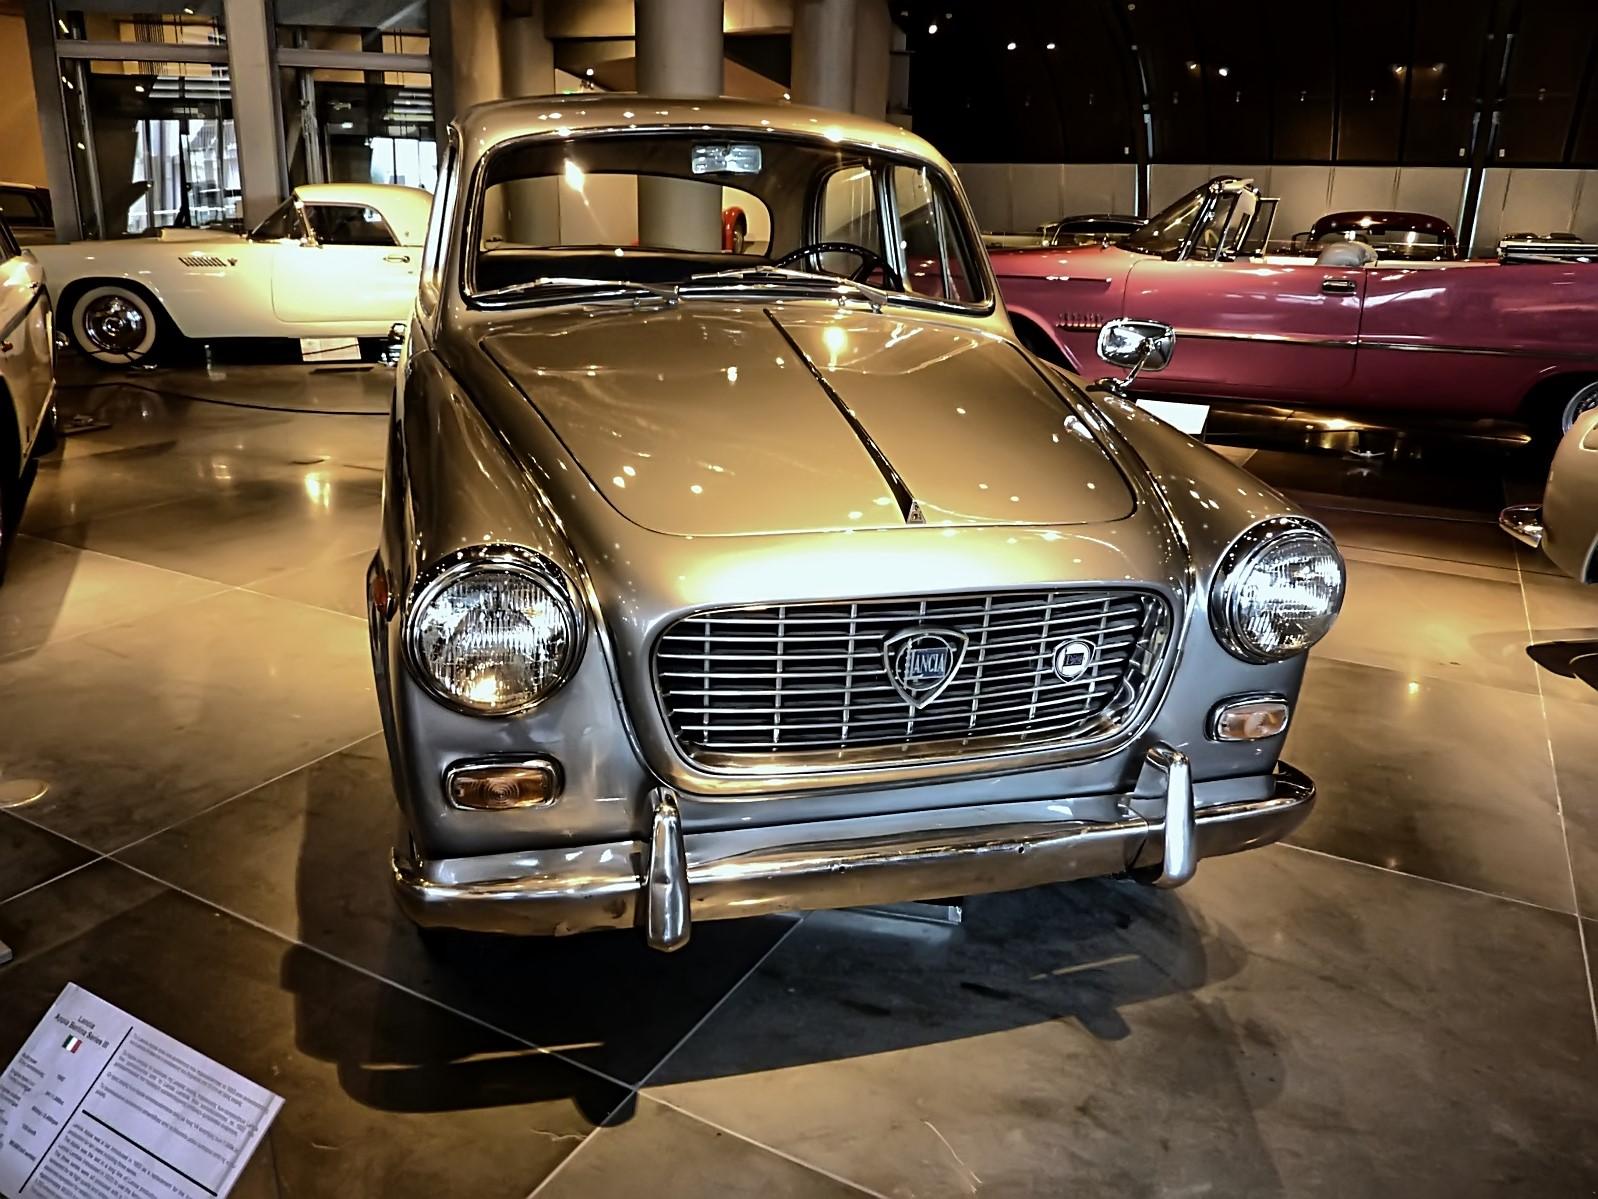 hellenic motor museum (9).JPG